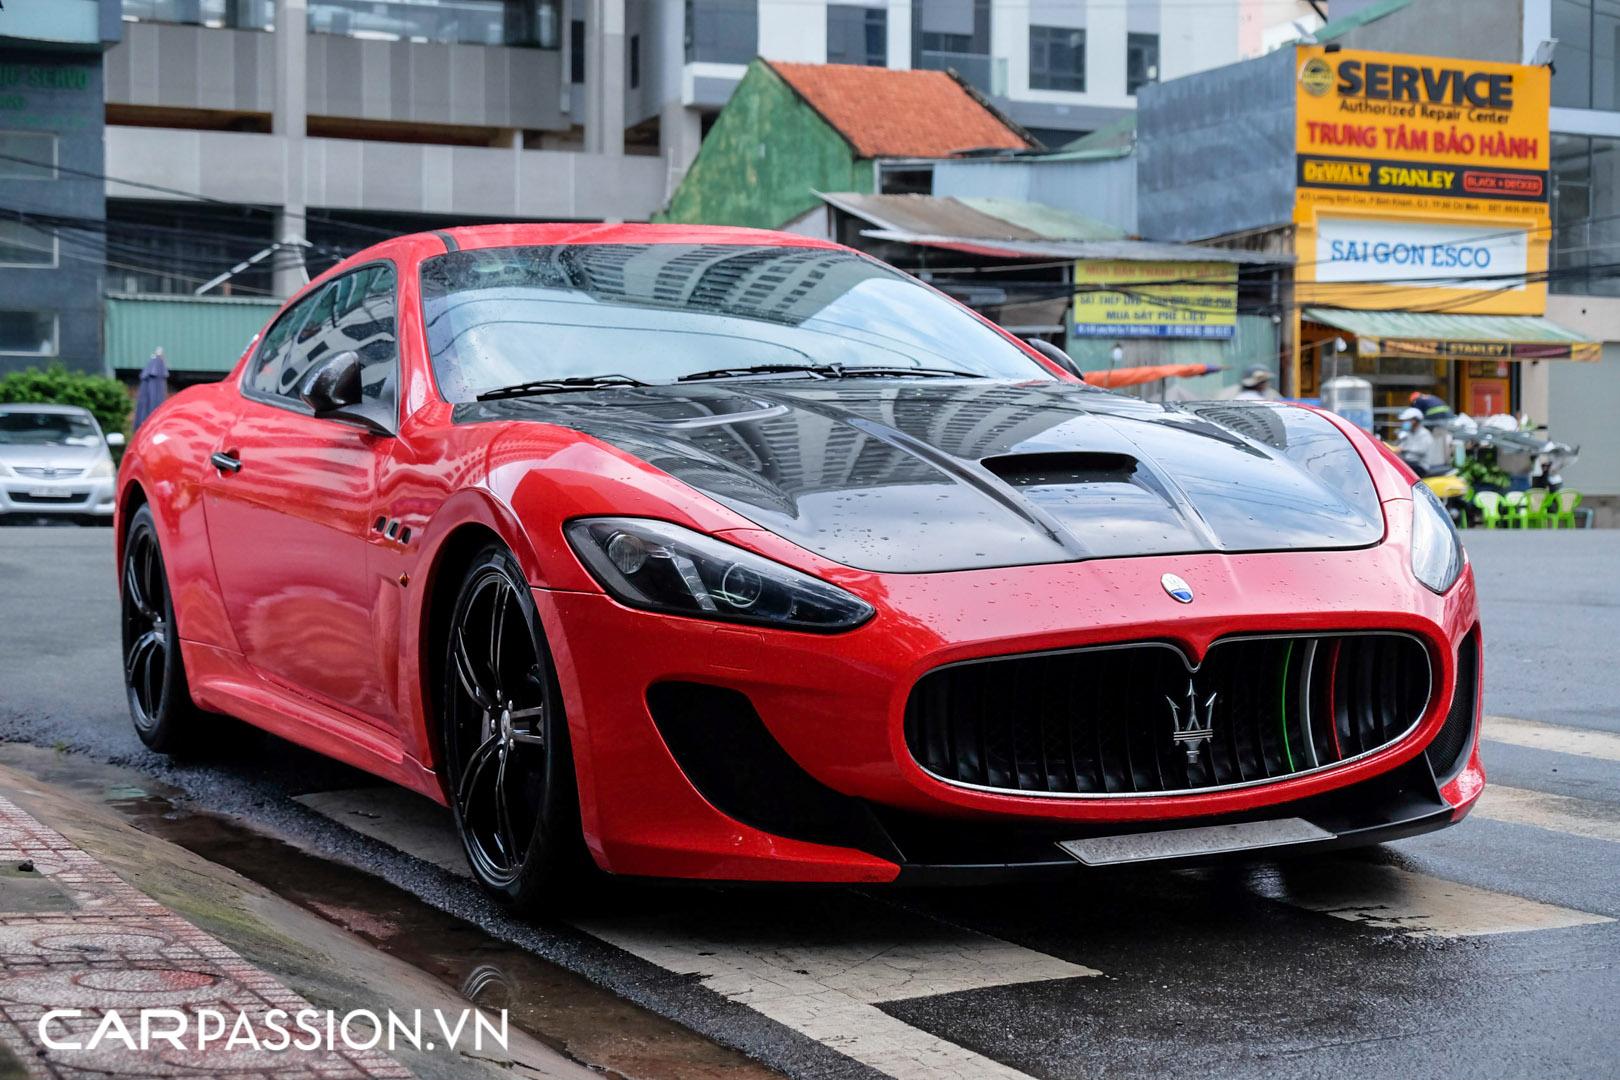 CP-Maserati GranTurismo MC Stradale (29).JPG